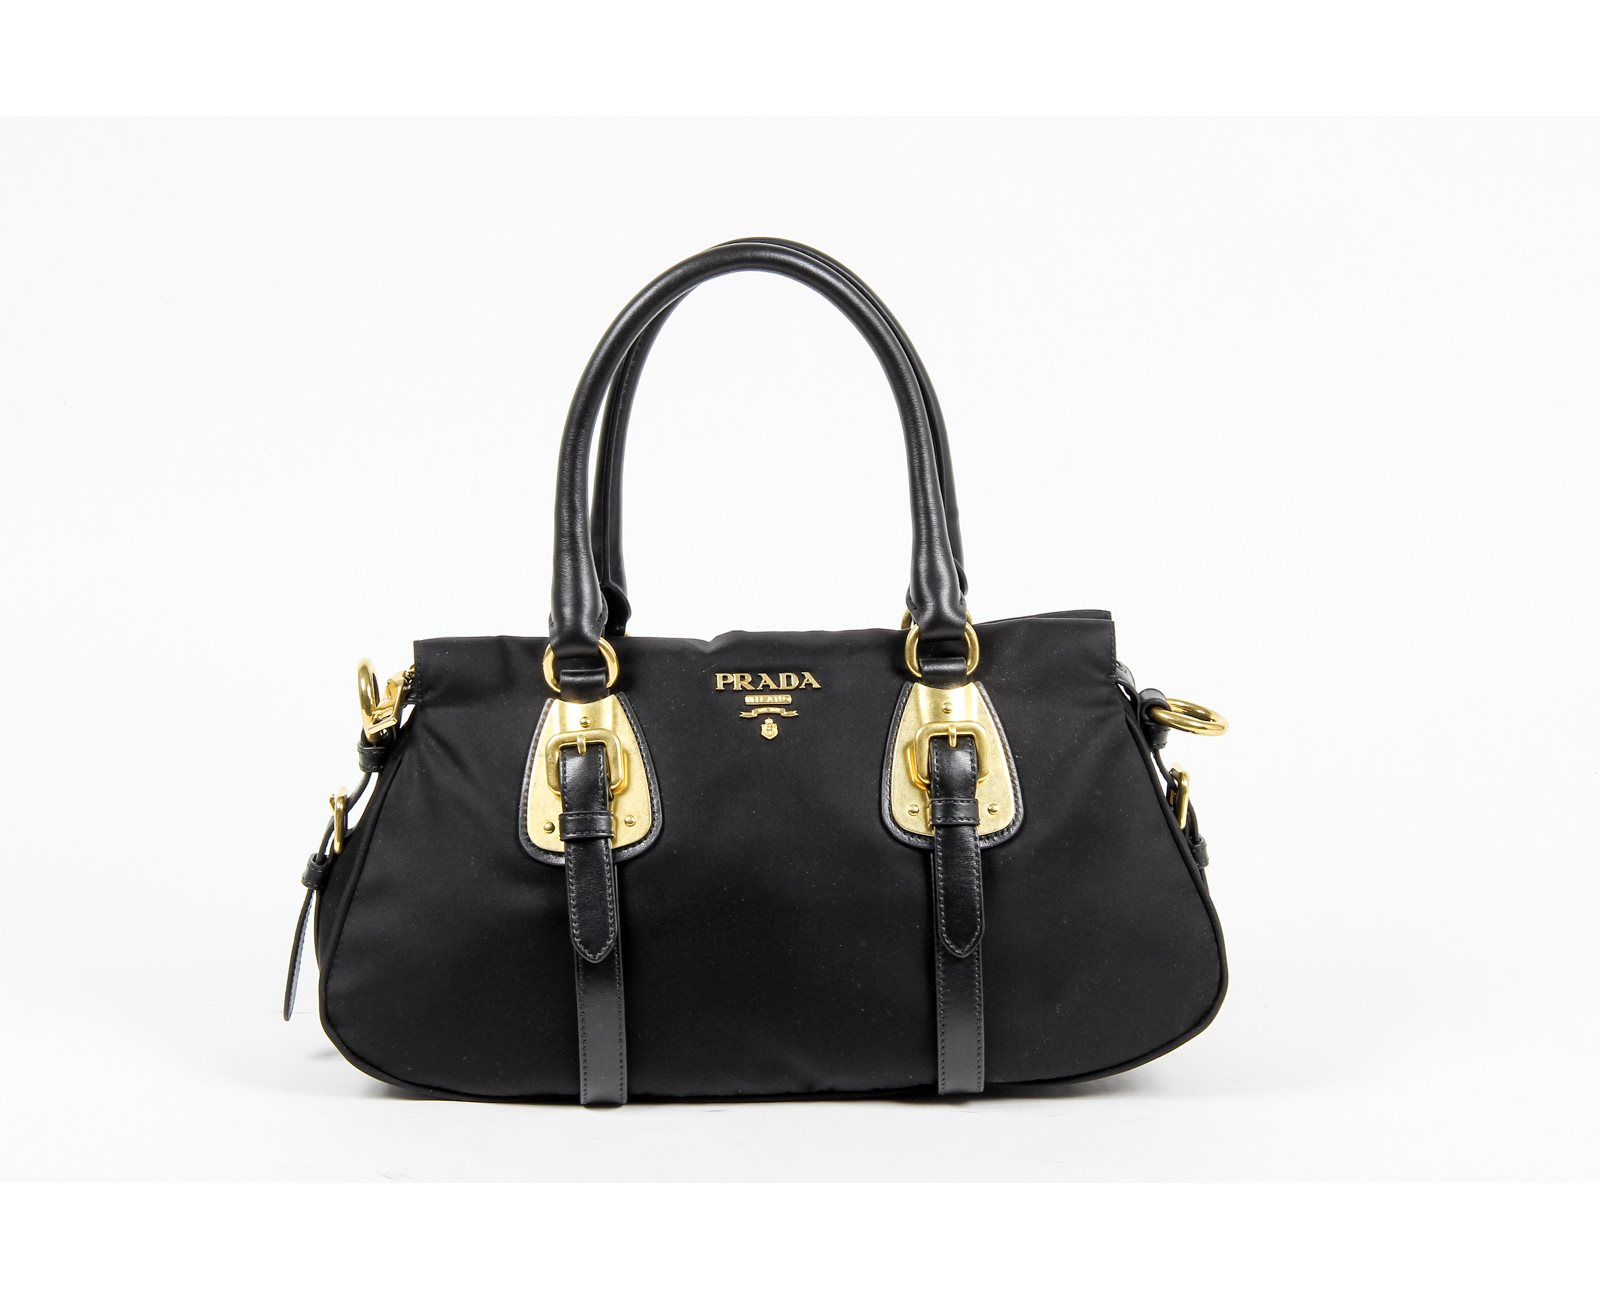 b7625da8392e Prada ladies bn1903 tessuto nylon top handle convertible tote handbag  original